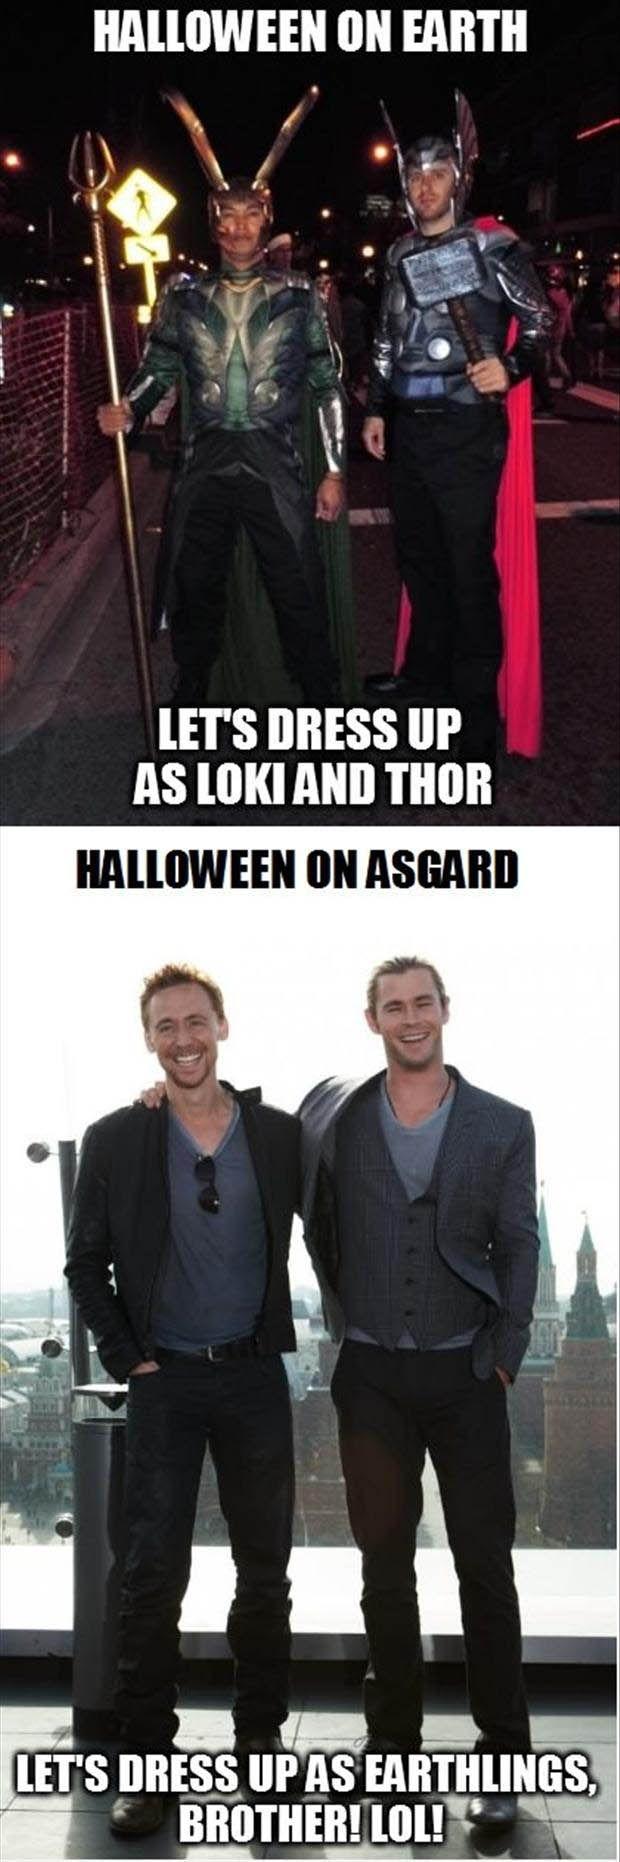 Thor and Loki hahaha